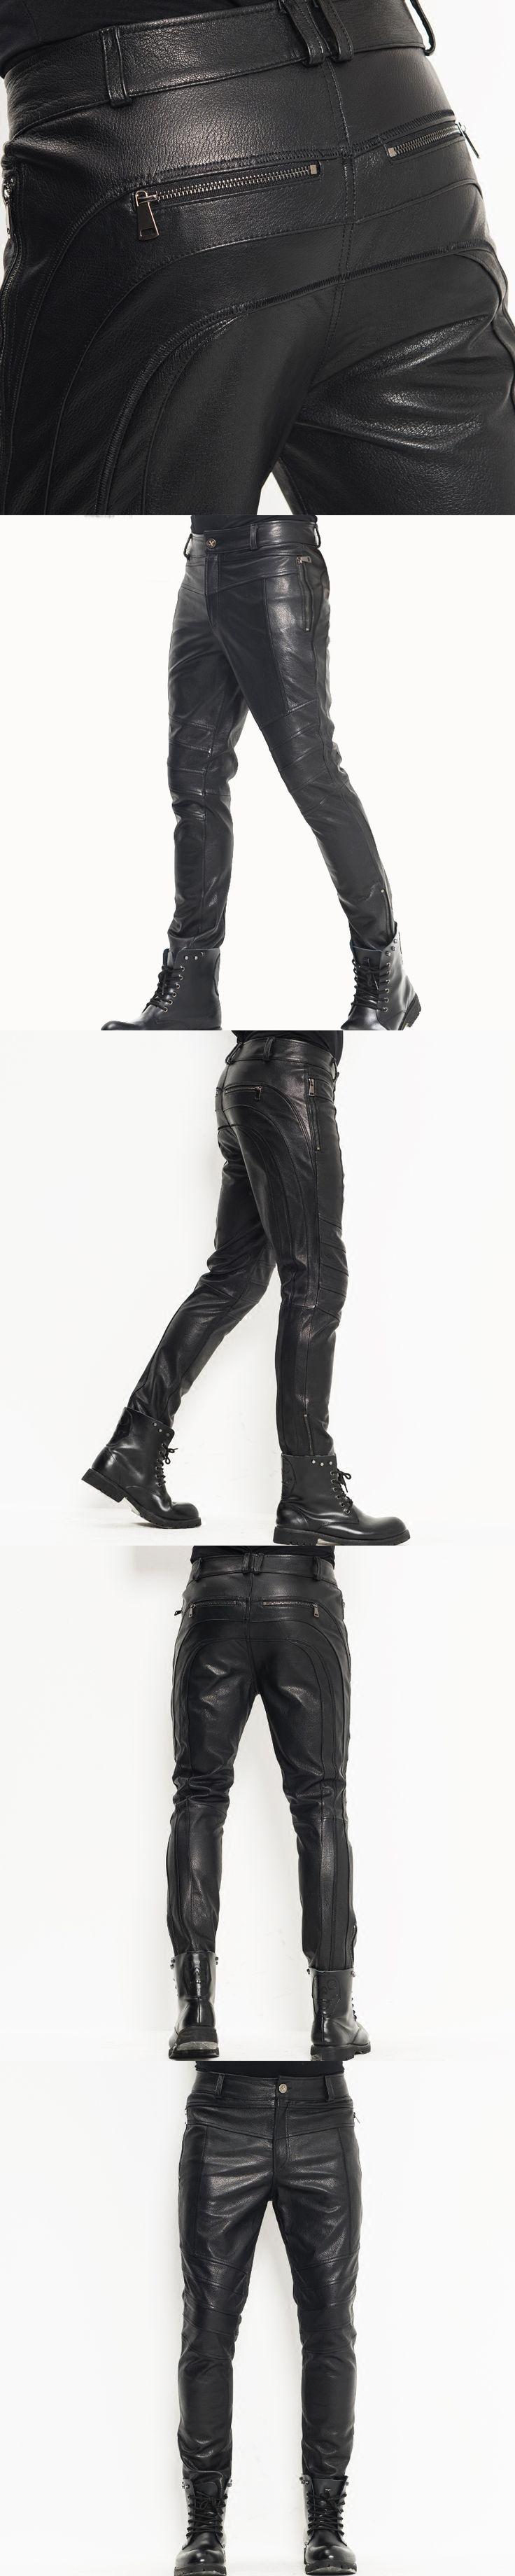 Men's Leather Pants Moto&Biker Punk Rock Pants Nightclub Slim Sheepskin Leather Trousers  WZS005